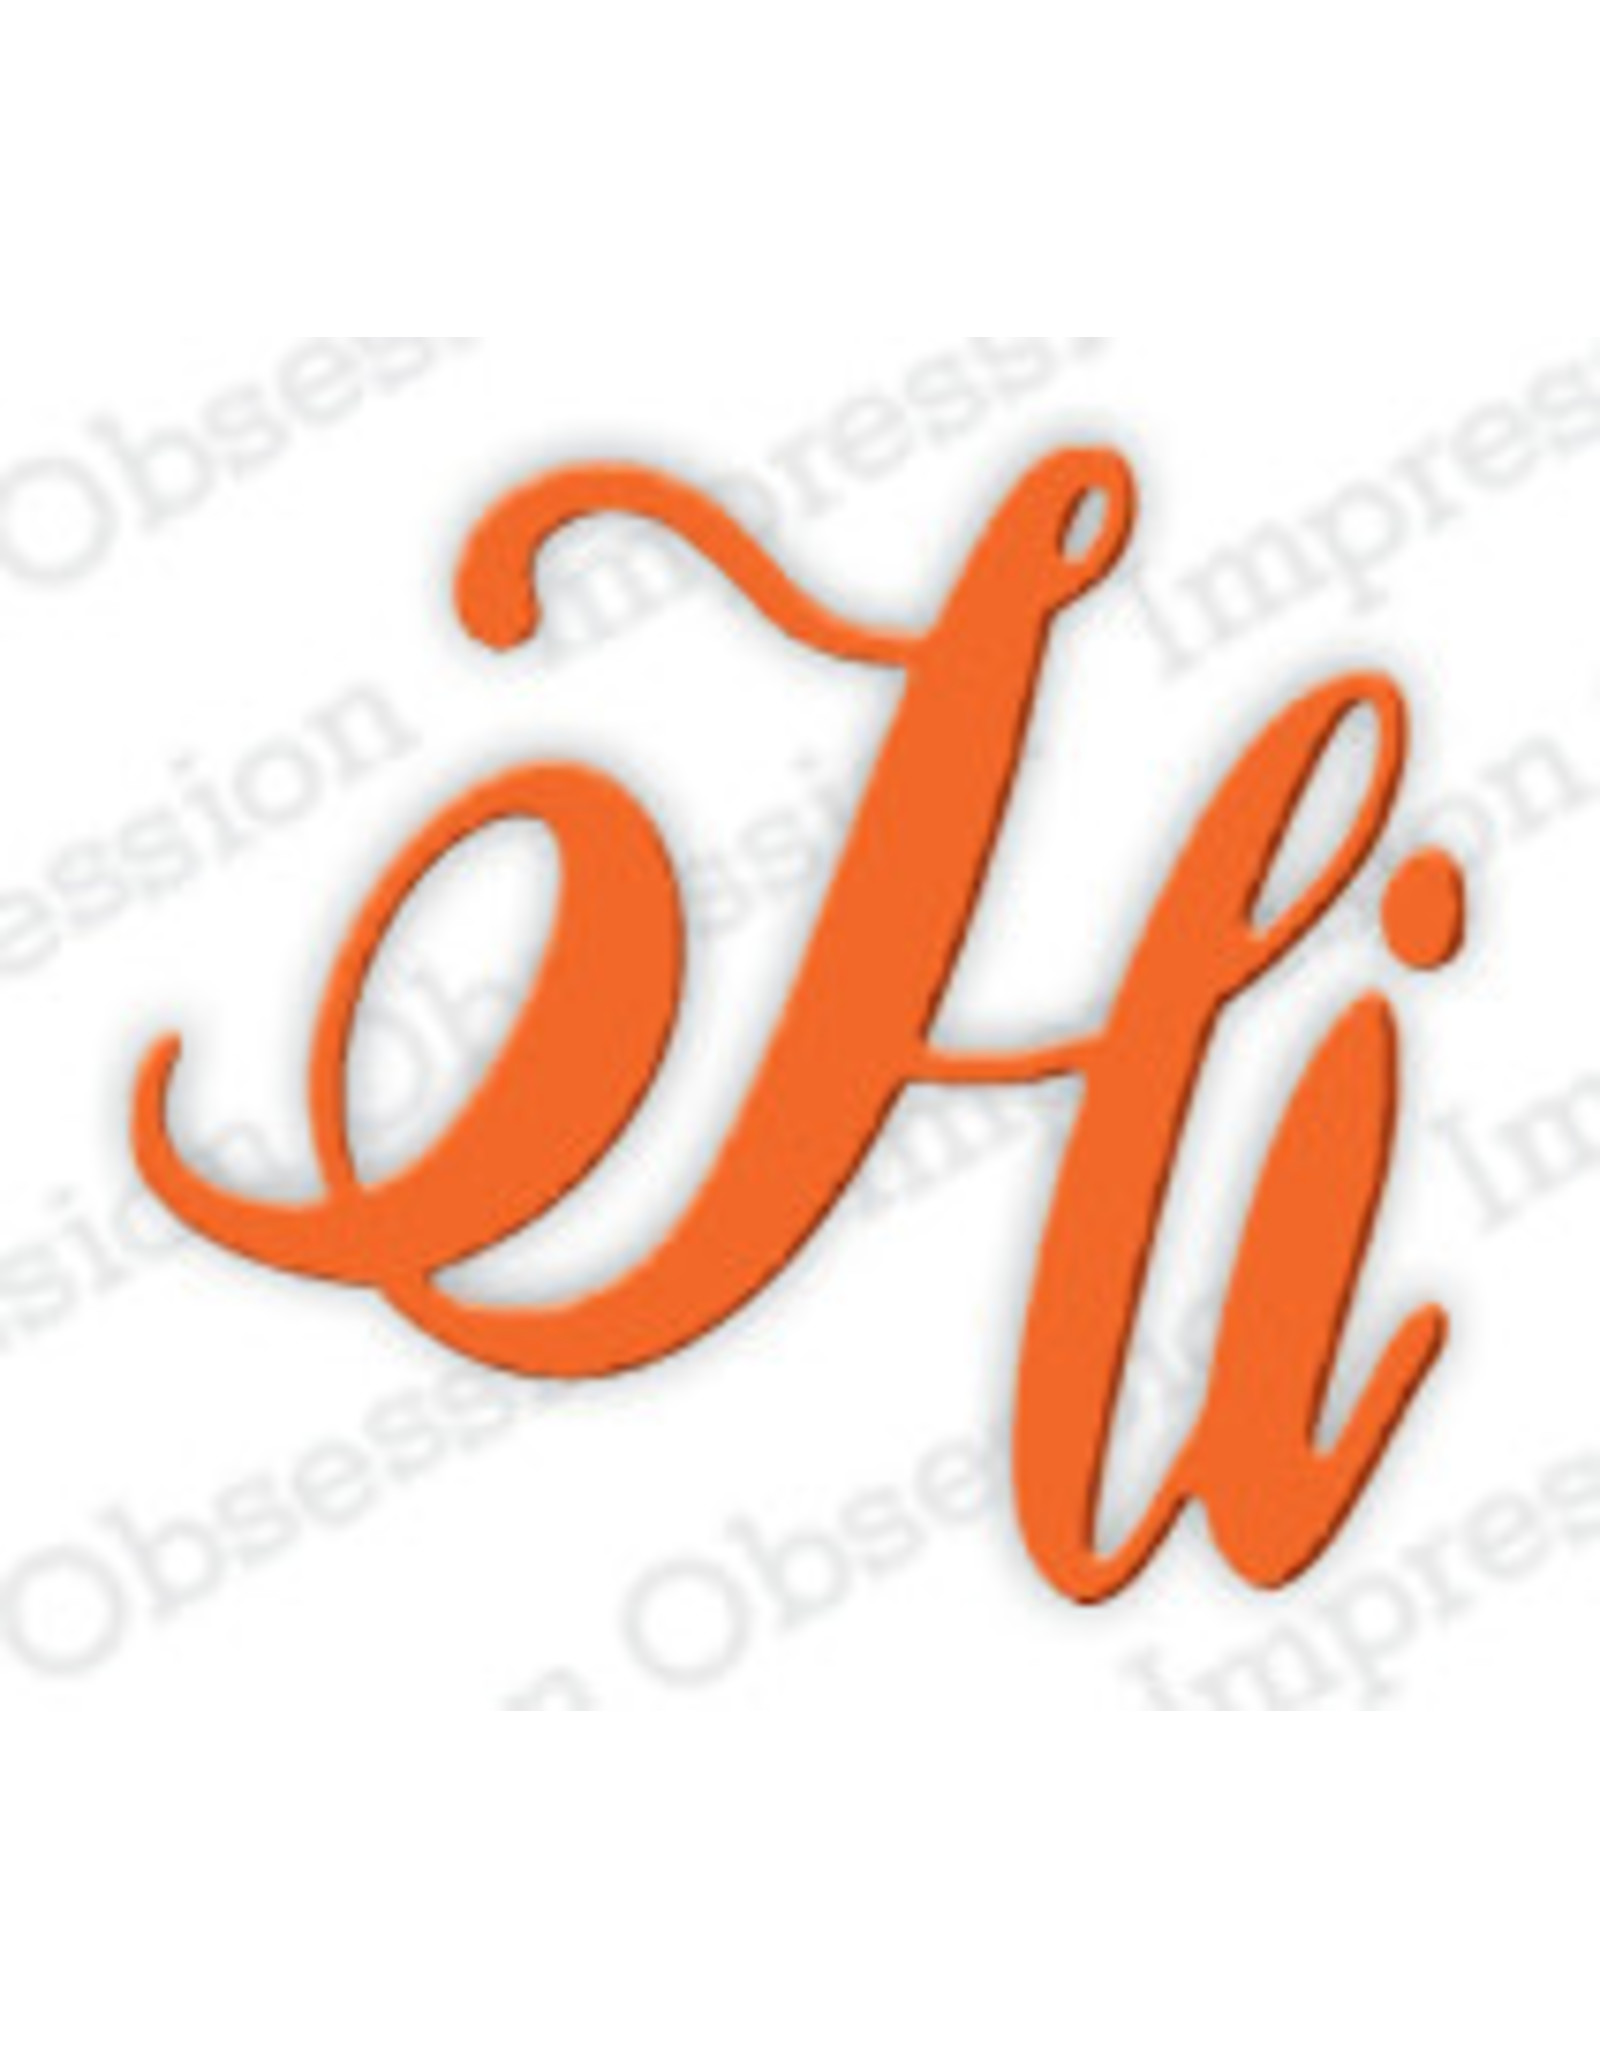 Impression Obsession Hi - Die